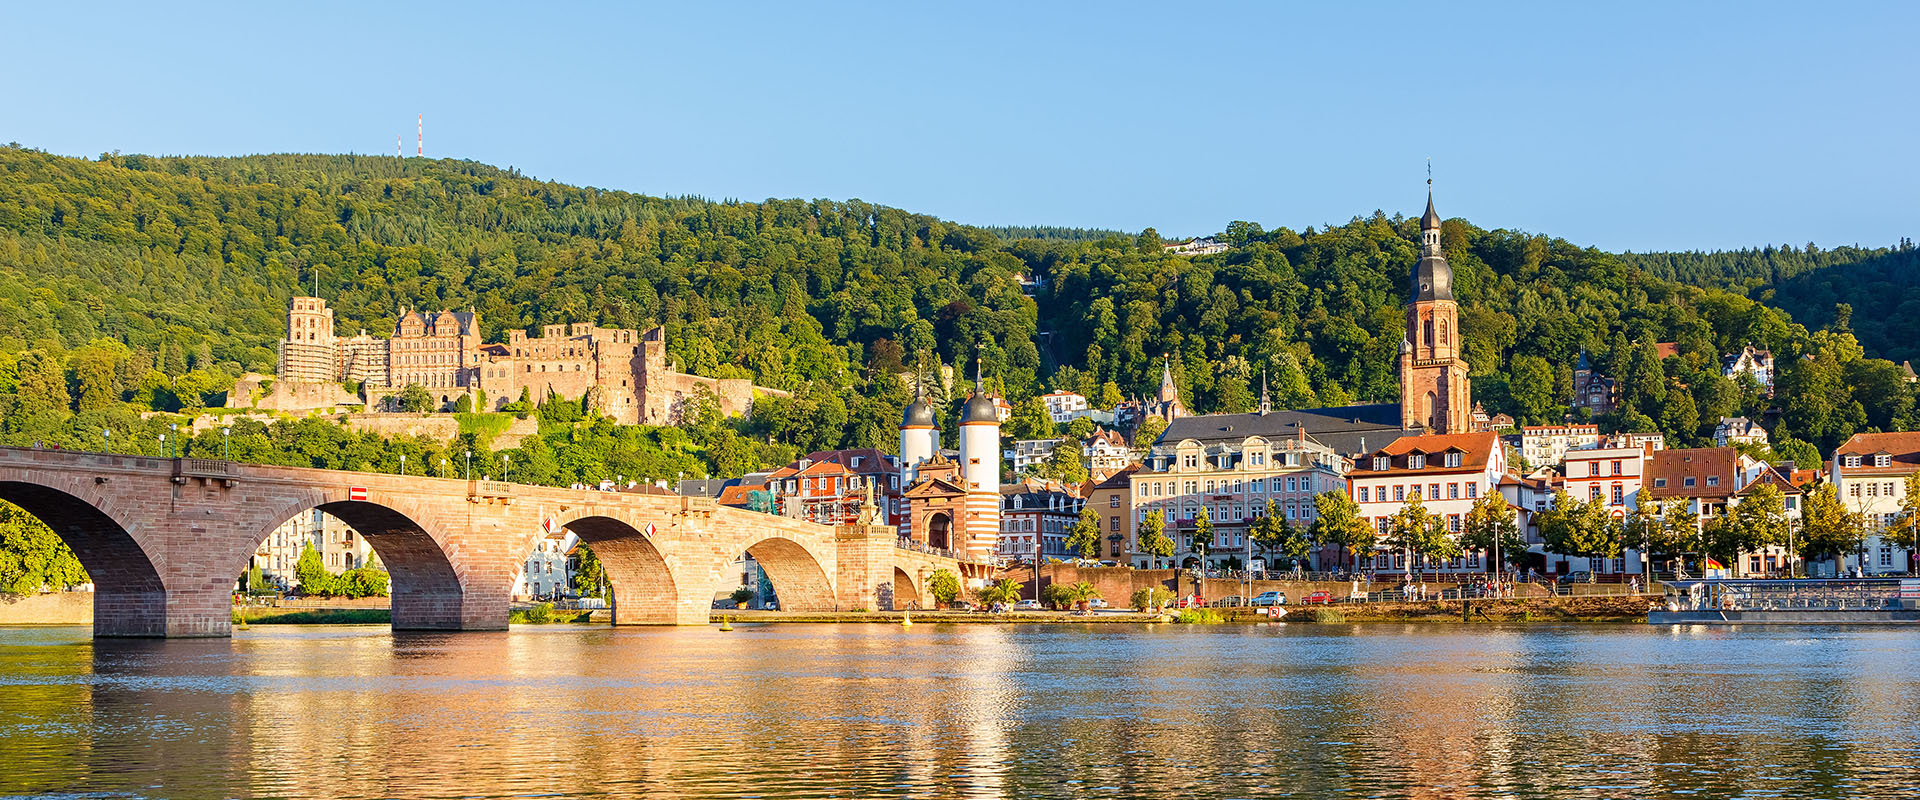 Emerald Sun River Cruising Europe Exterior